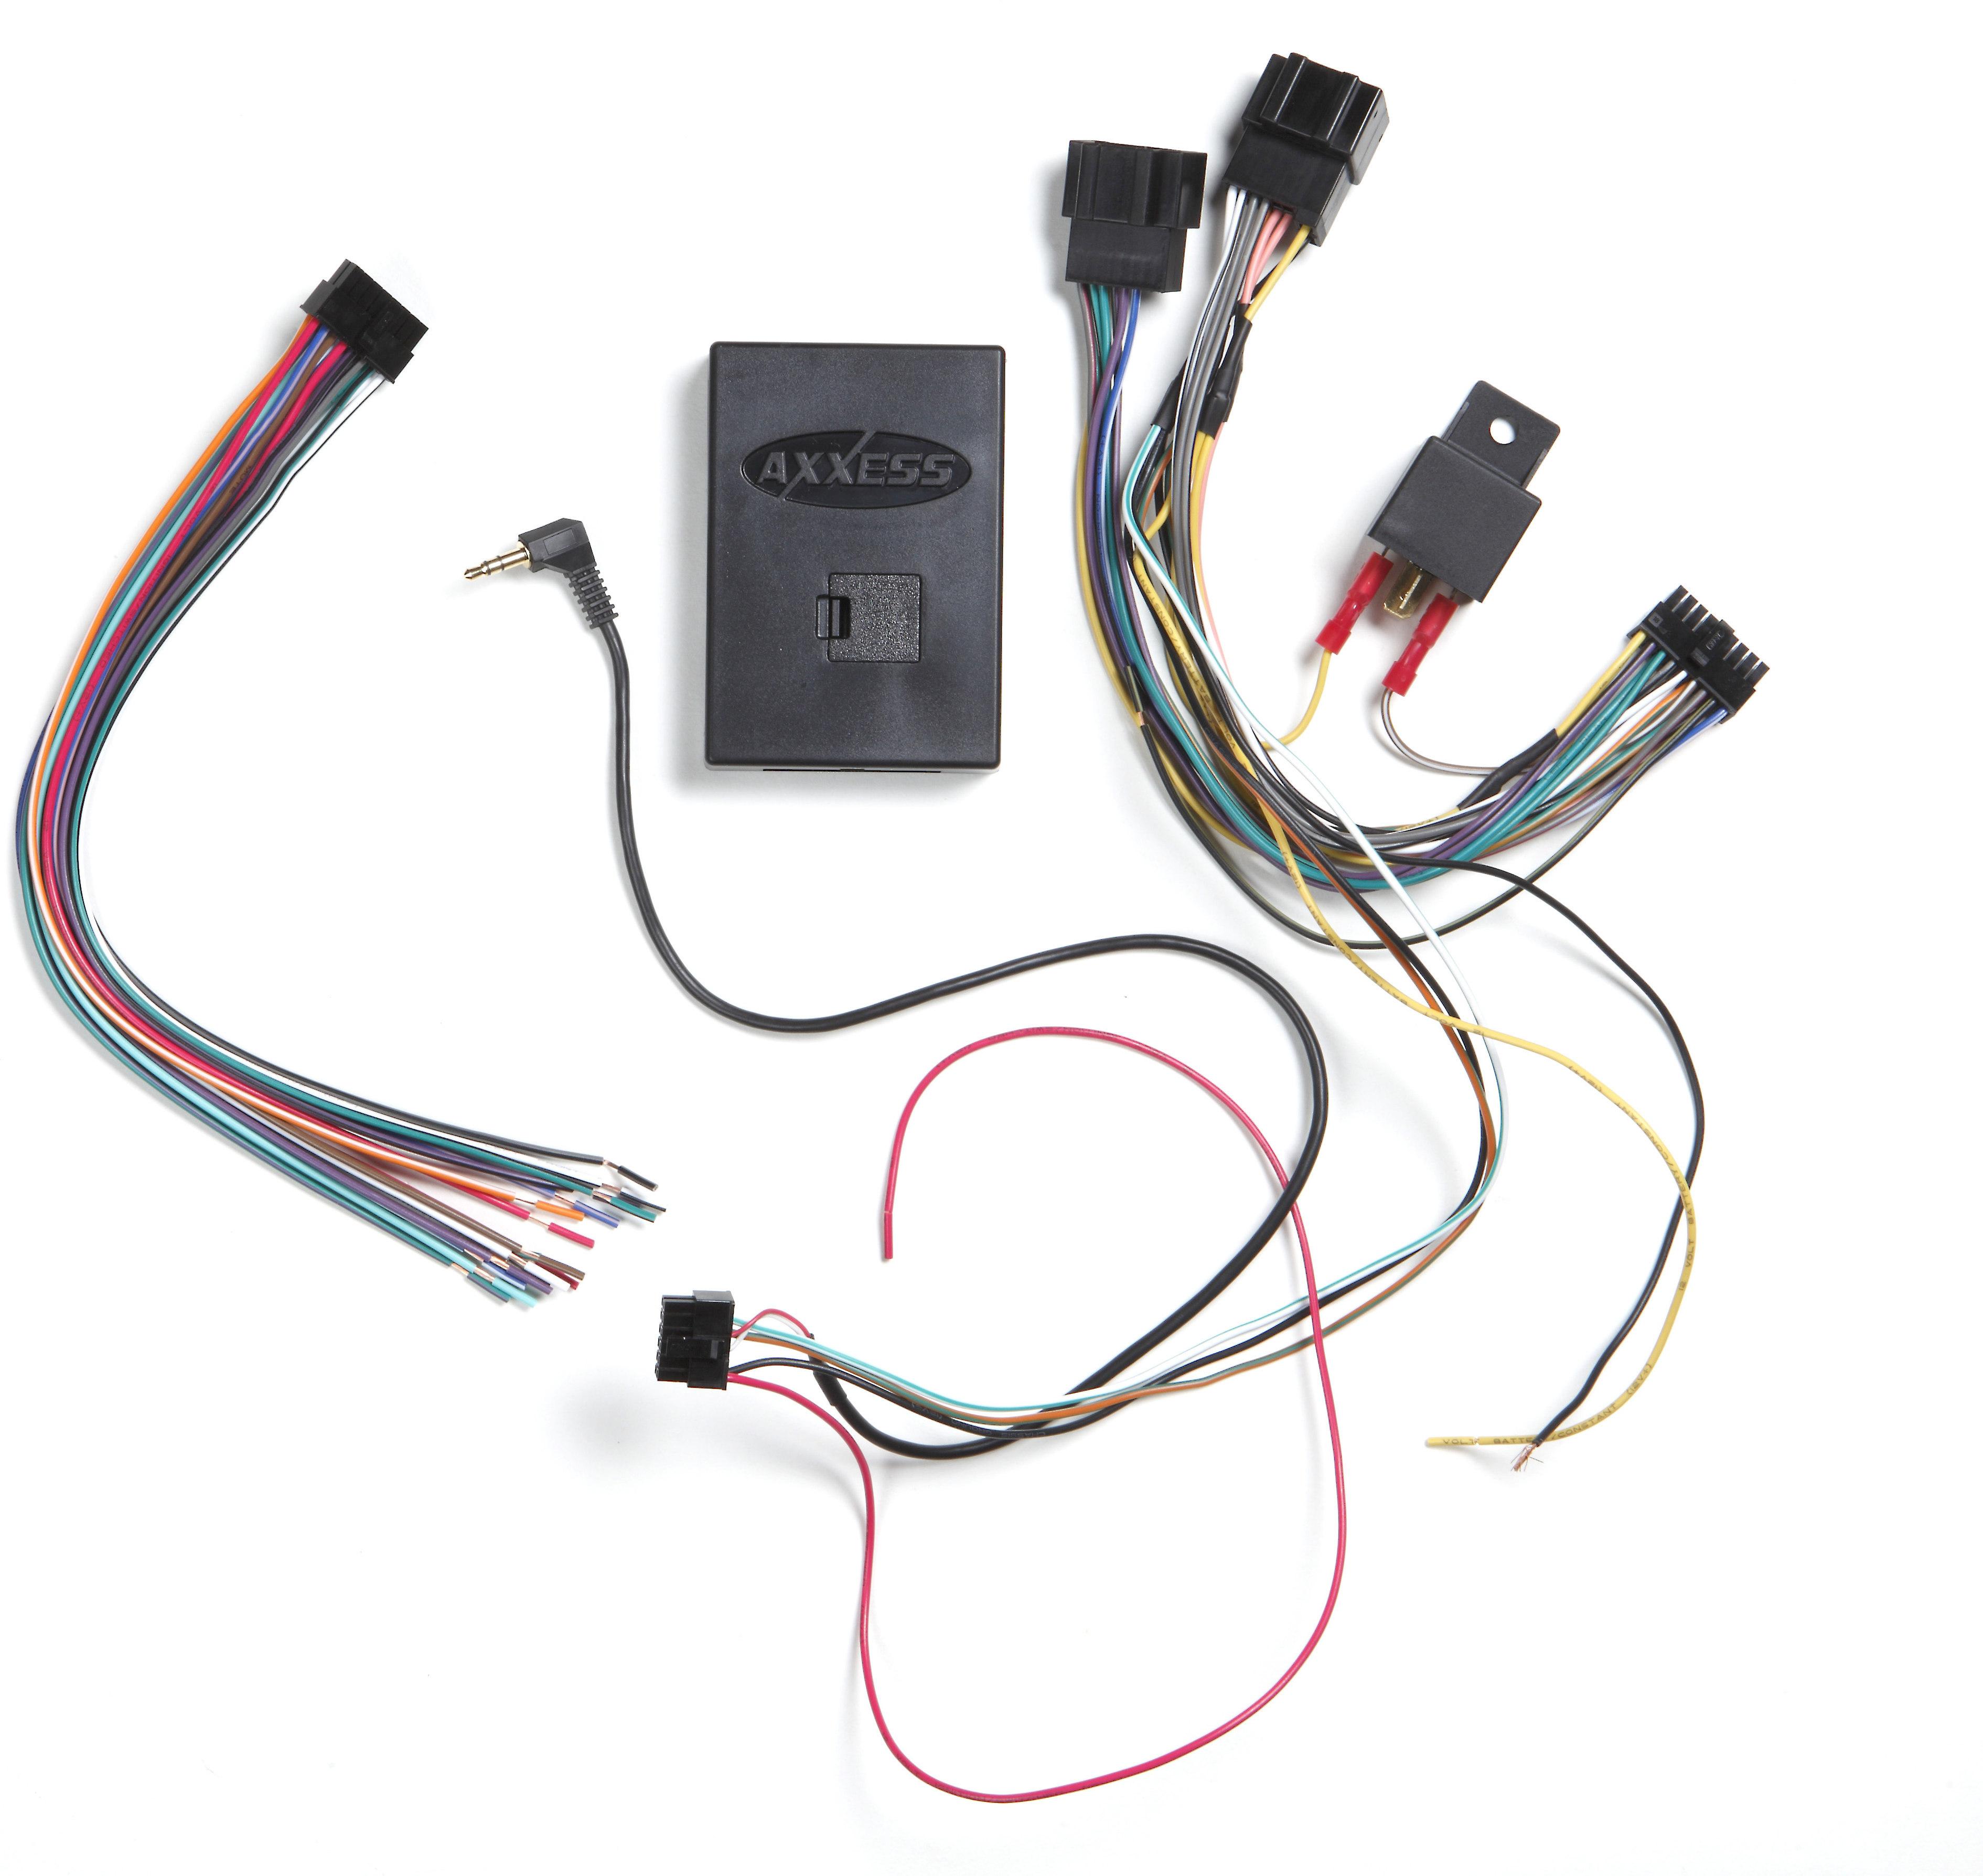 axxess interface wiring diagram new model wiring diagram